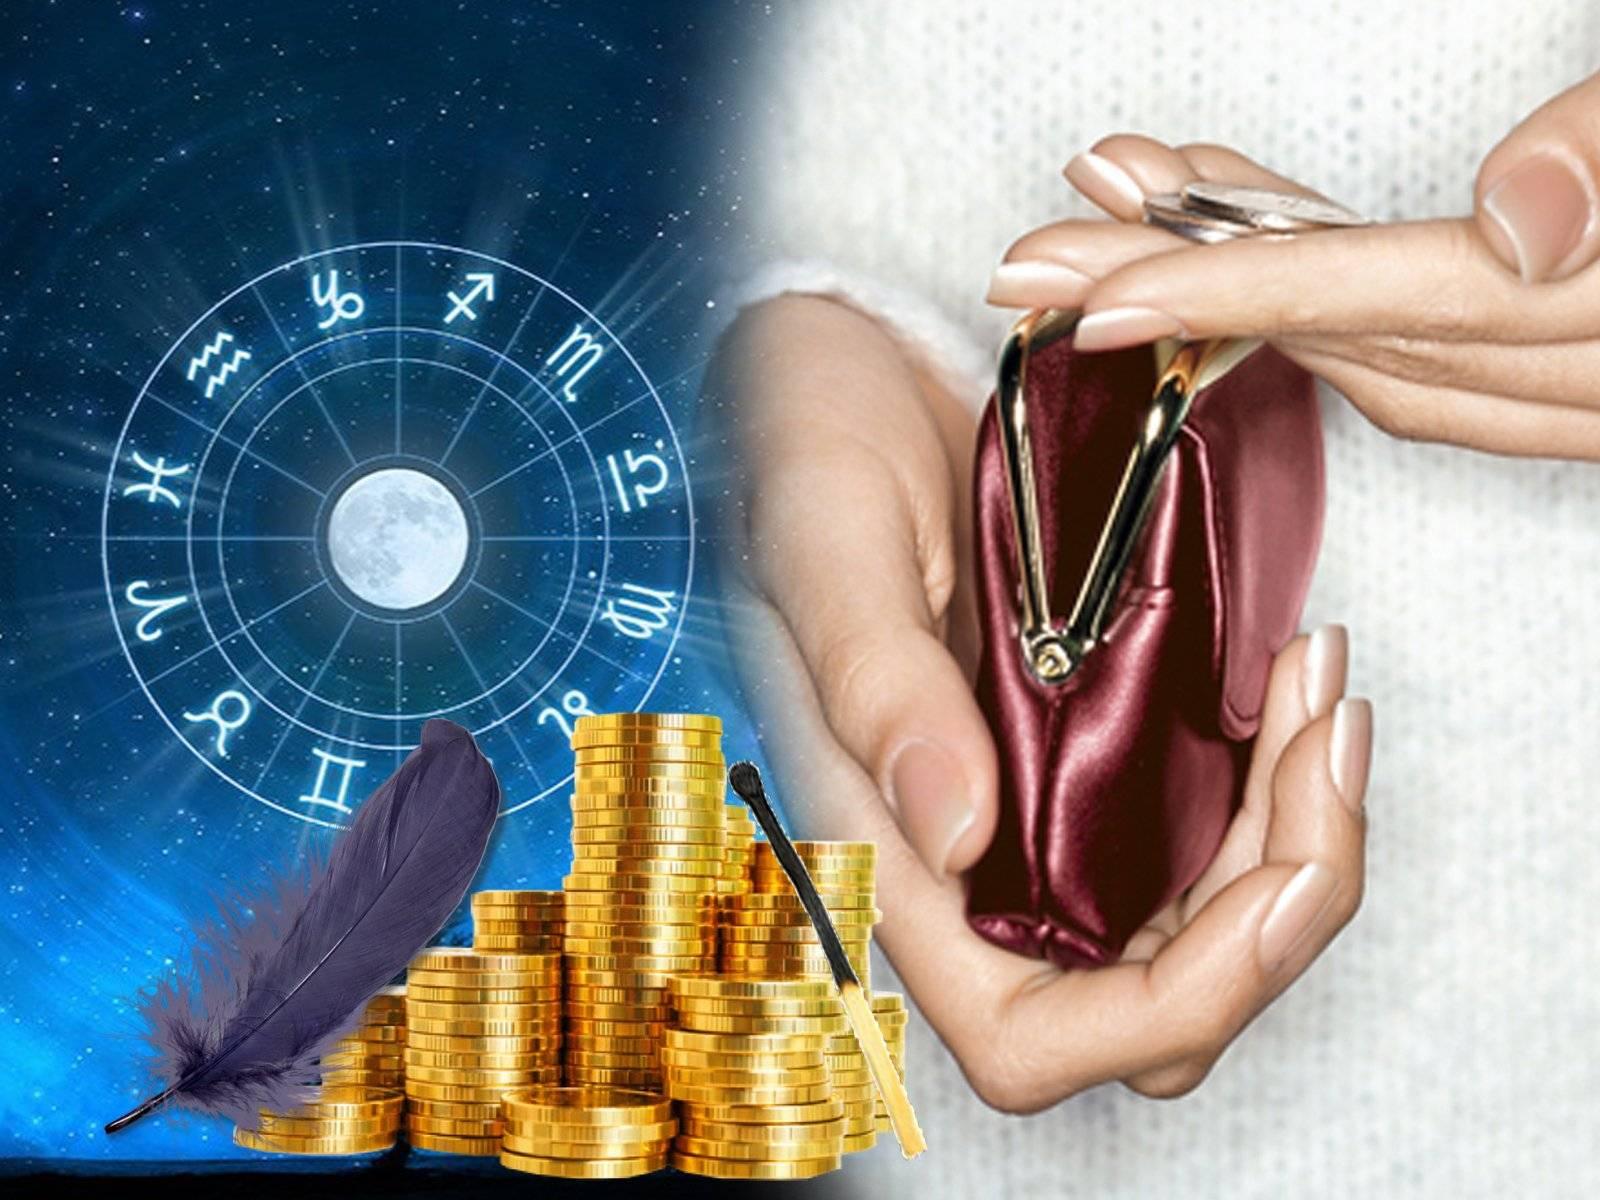 Показатели богатства и процветания в гороскопе